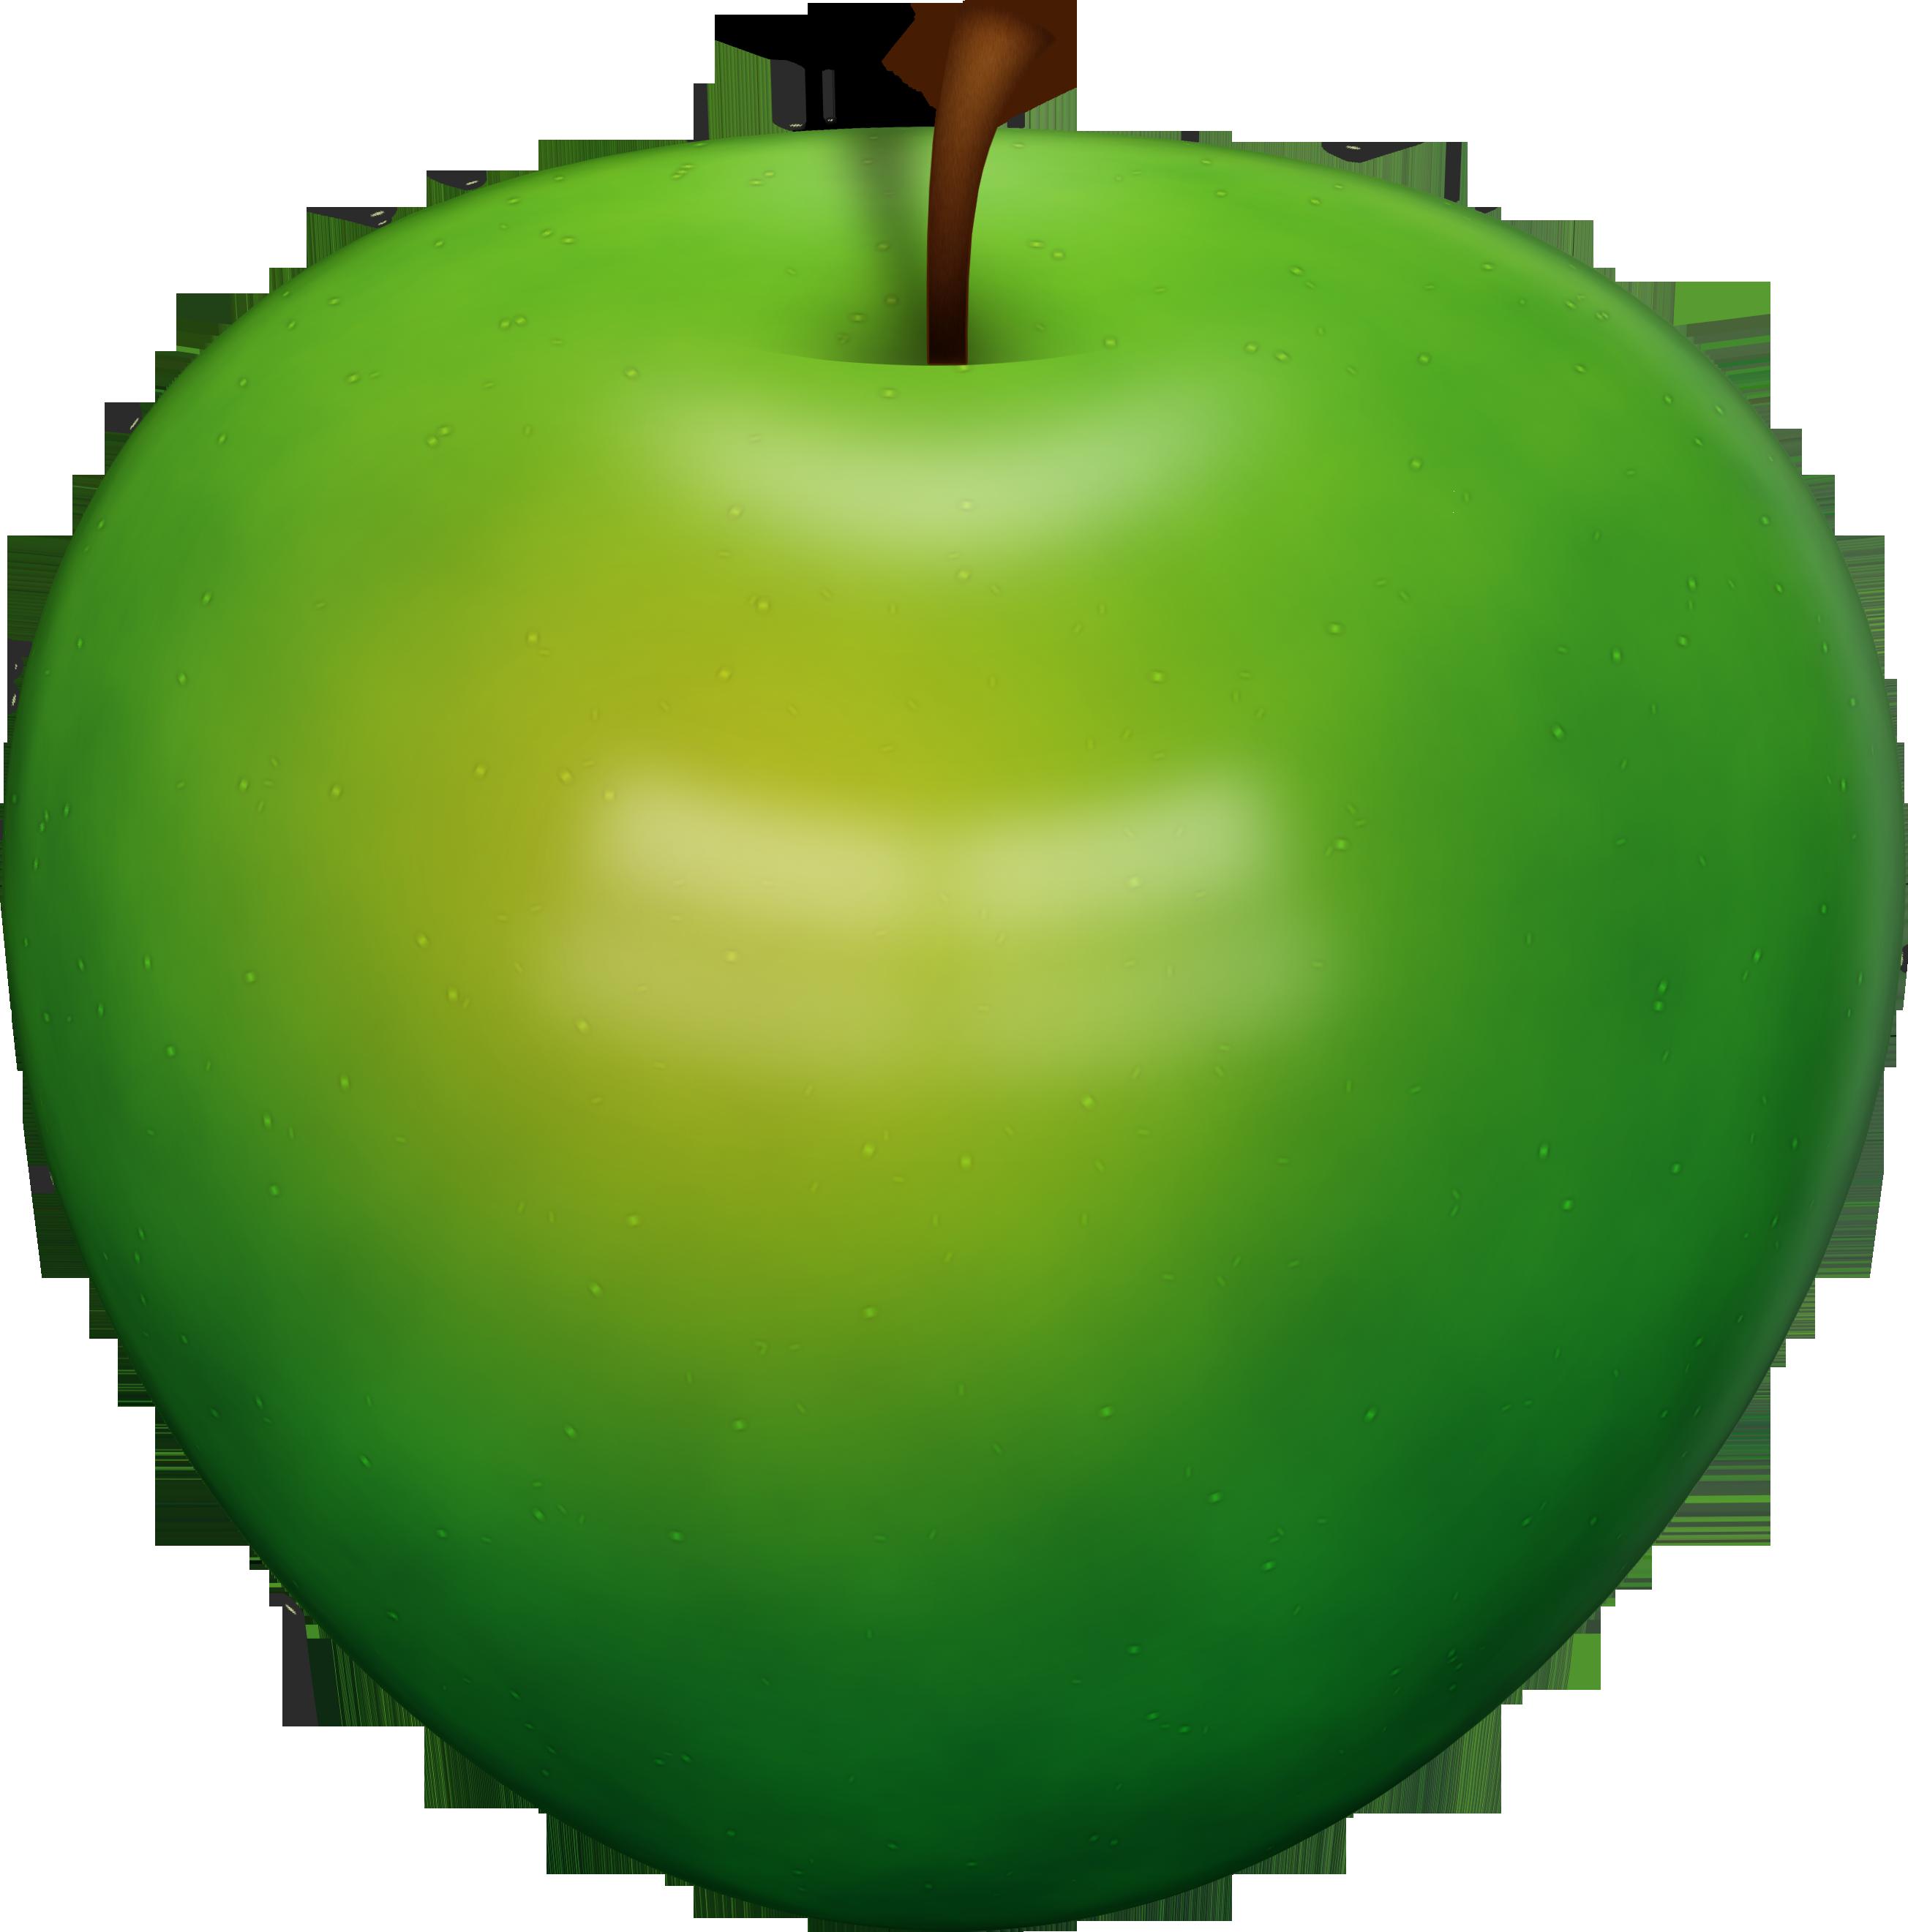 Green Apple S Png Image Apple Green Apple Green